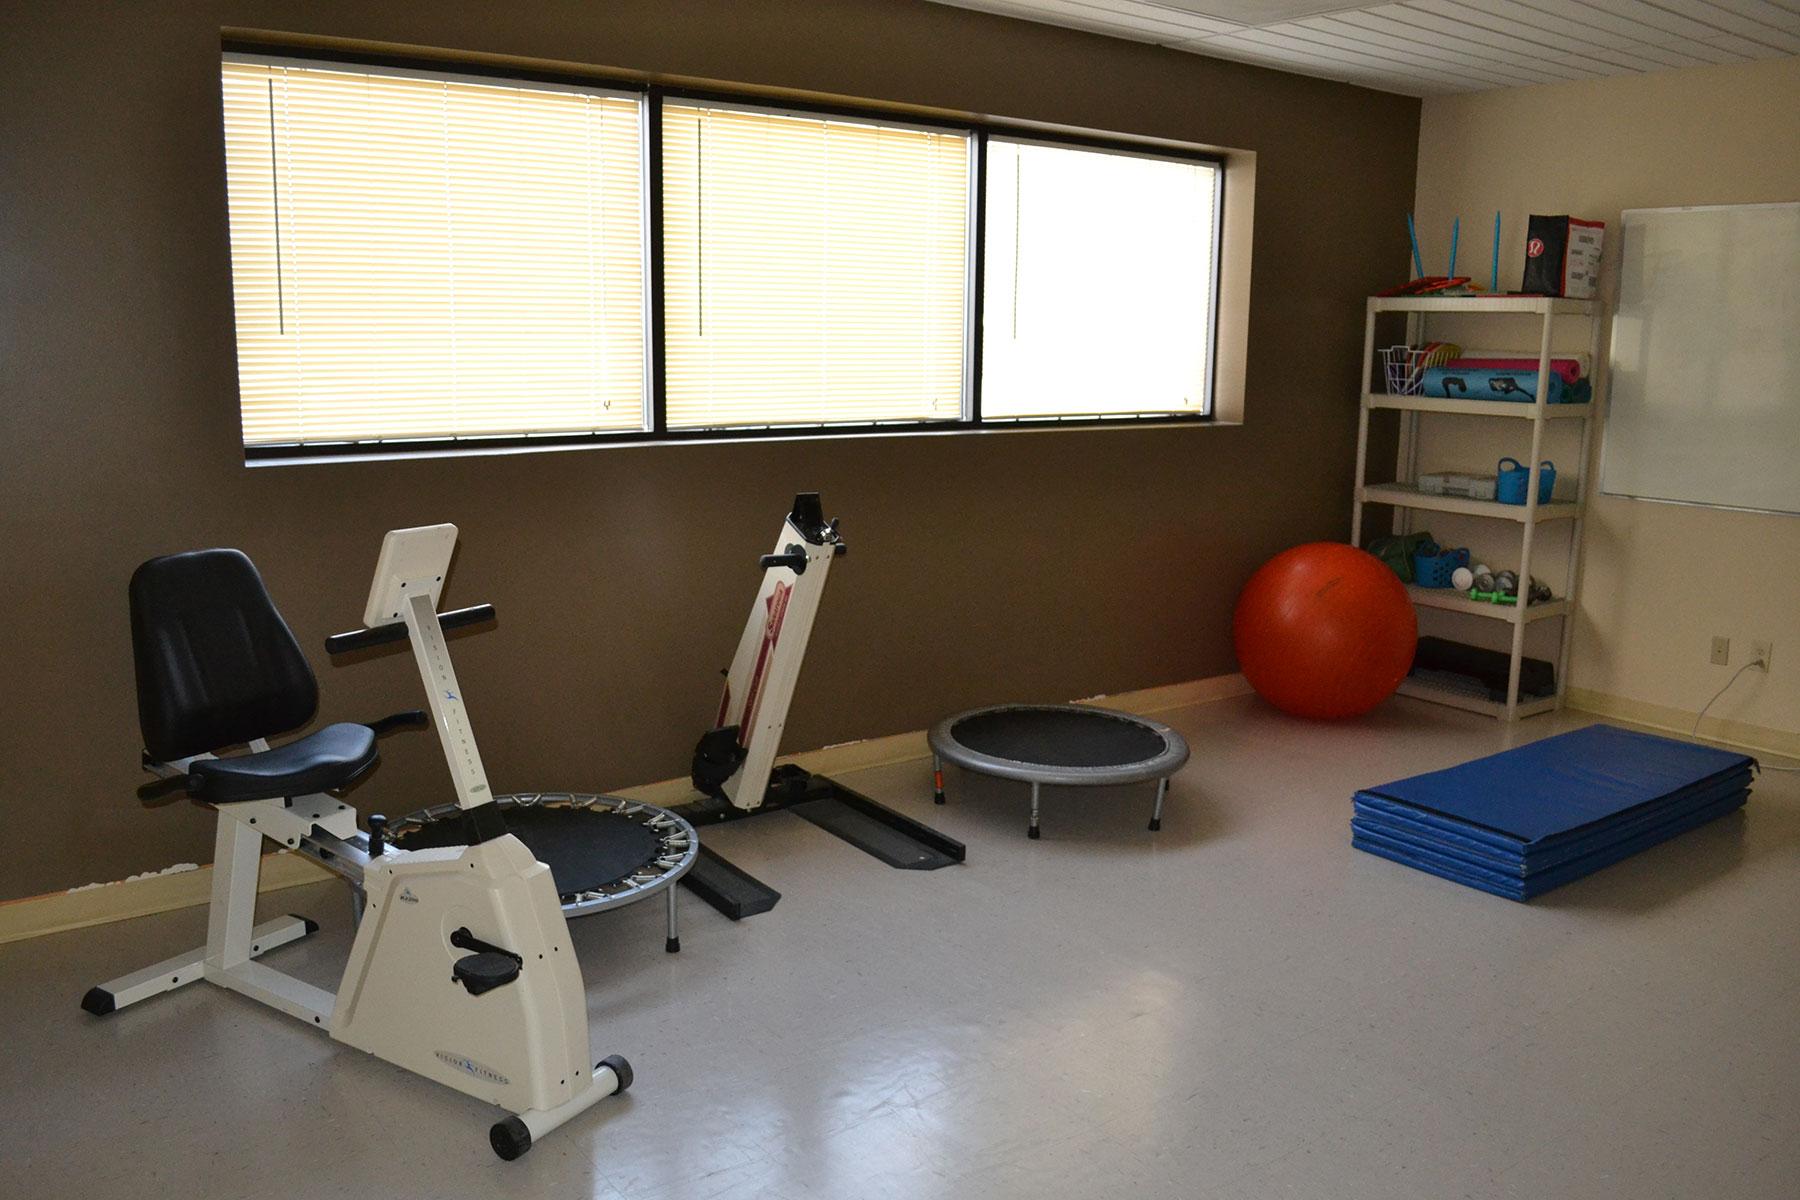 HighPointe Completes New Wellness Center!